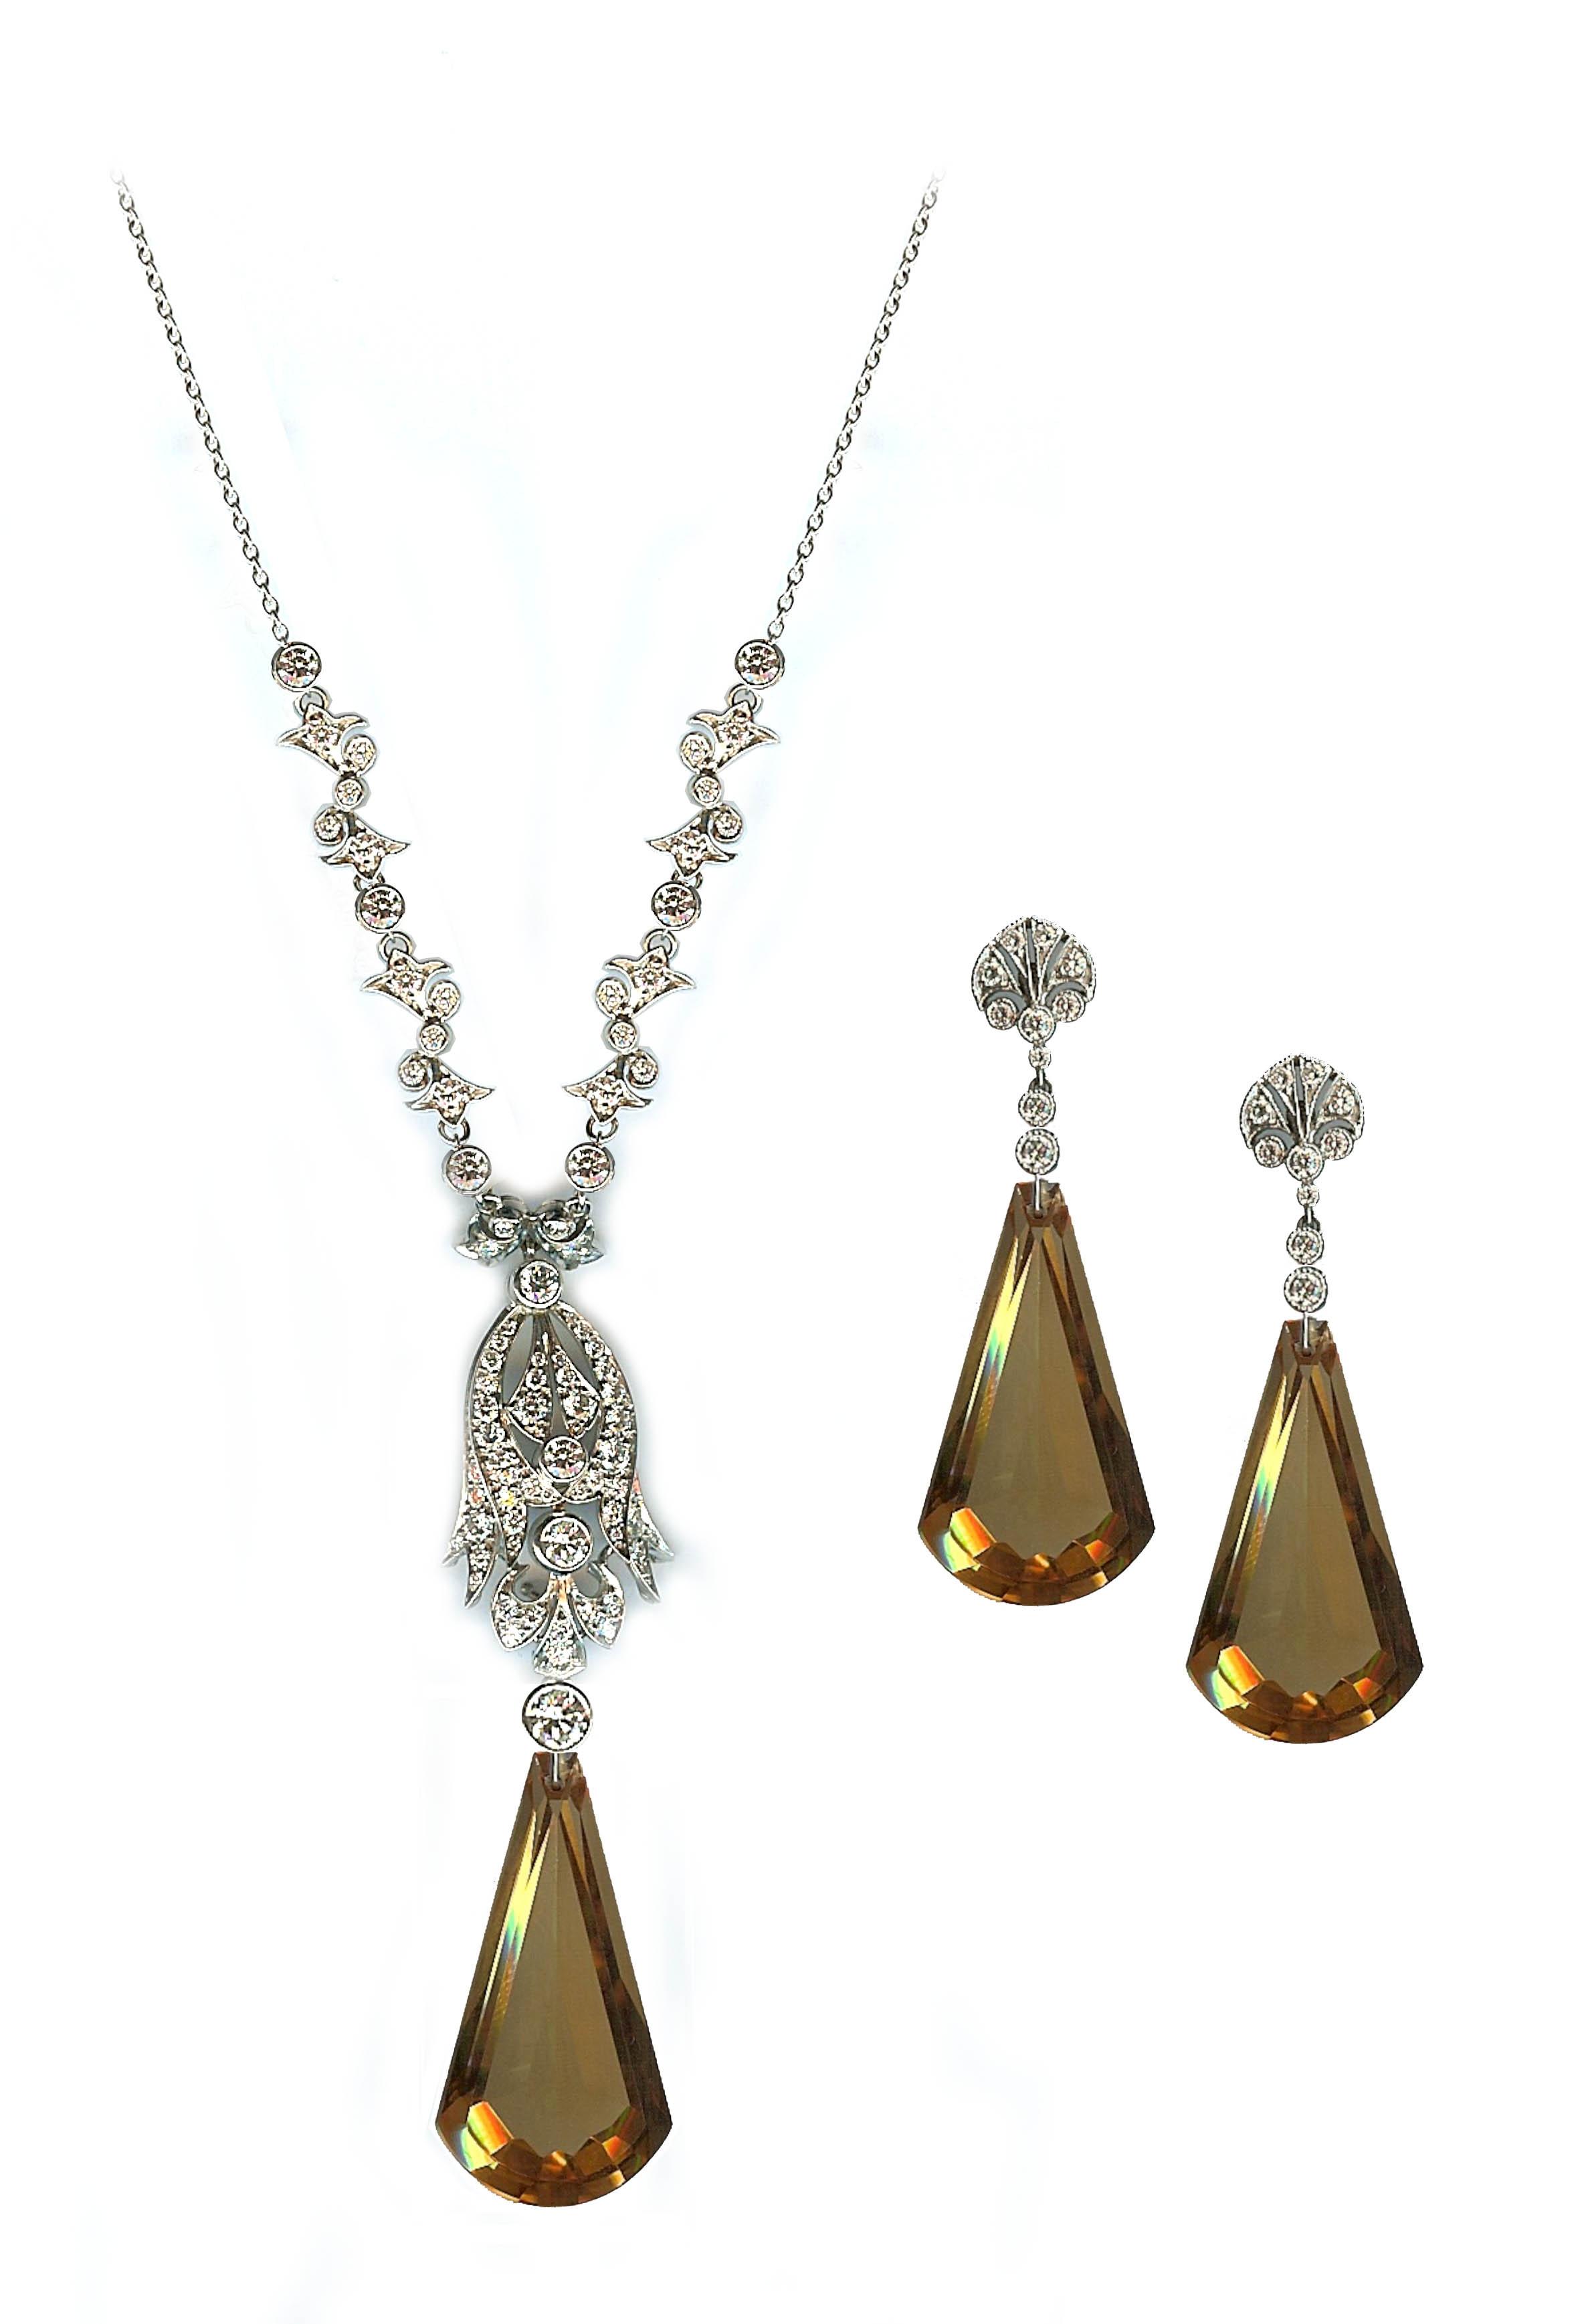 Stunning diamond and citrine suite